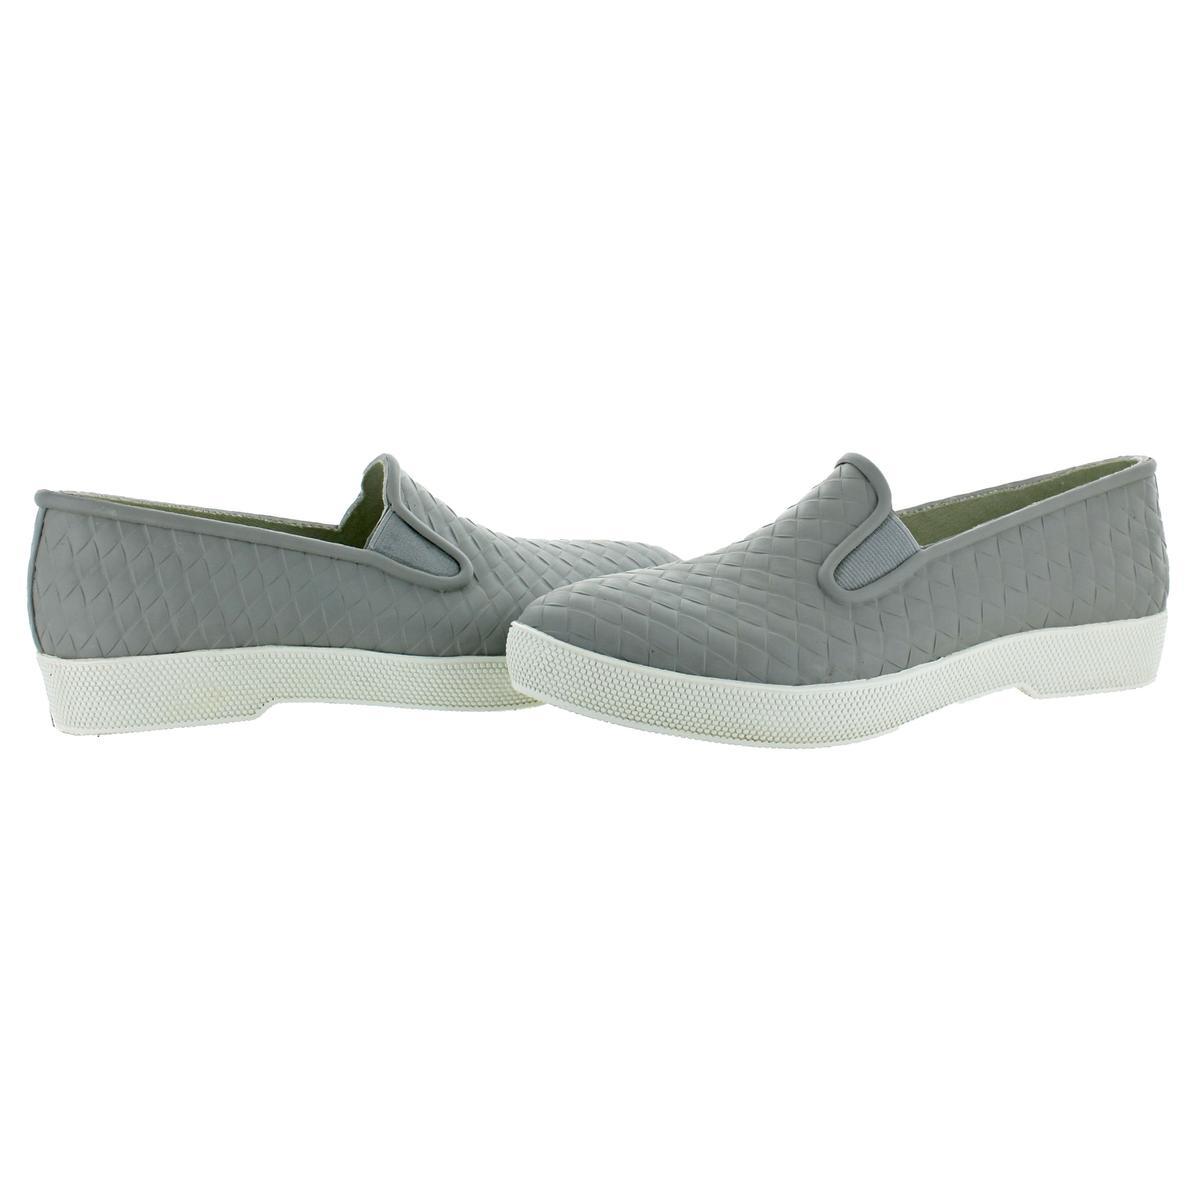 2699eec3aa5b Cougar Womens Swoon Gray Waterproof Rain Shoes SNEAKERS 7 Medium (b ...